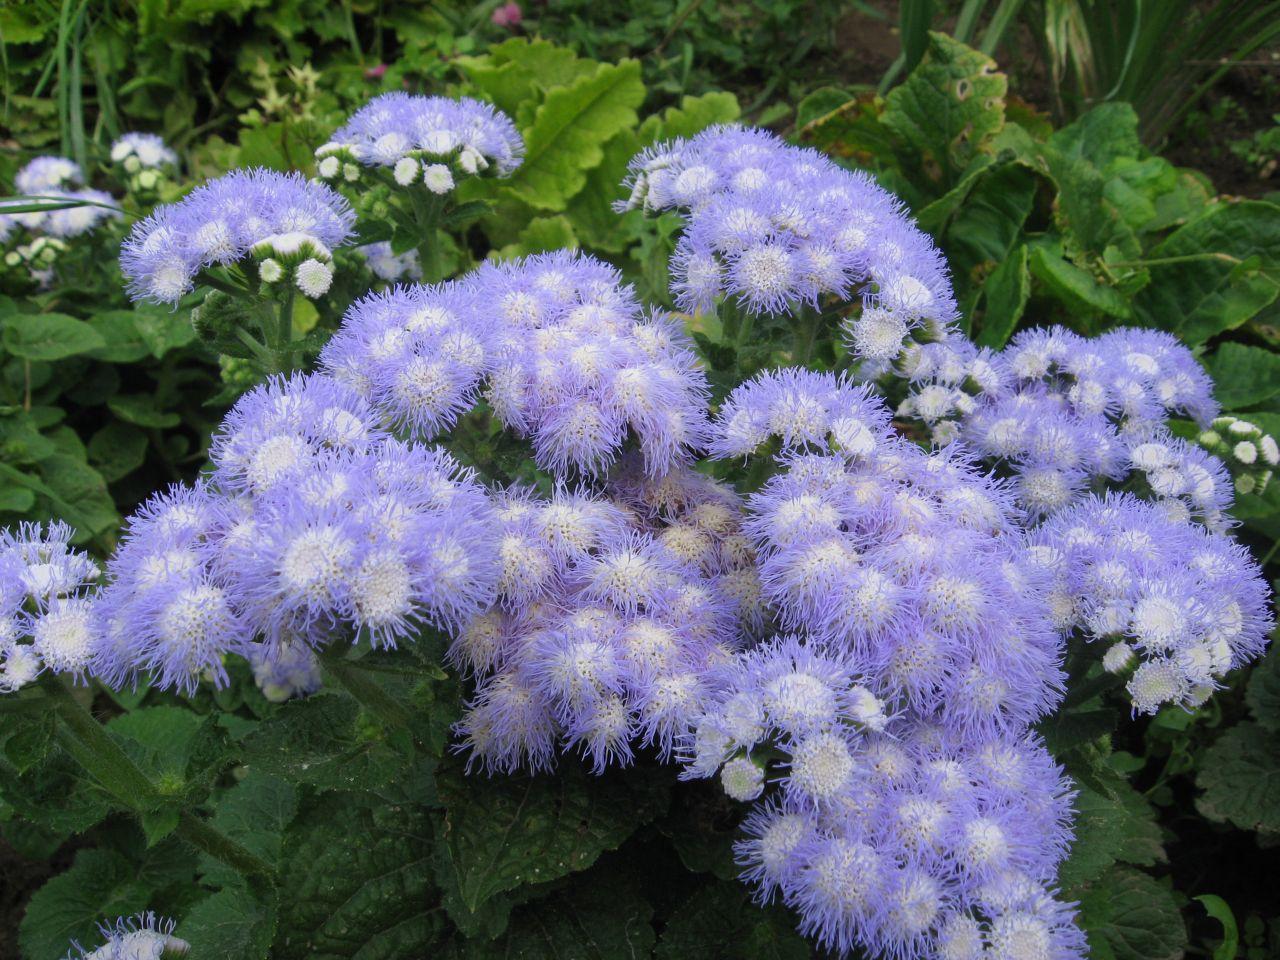 Цветы агератума посадка и уход